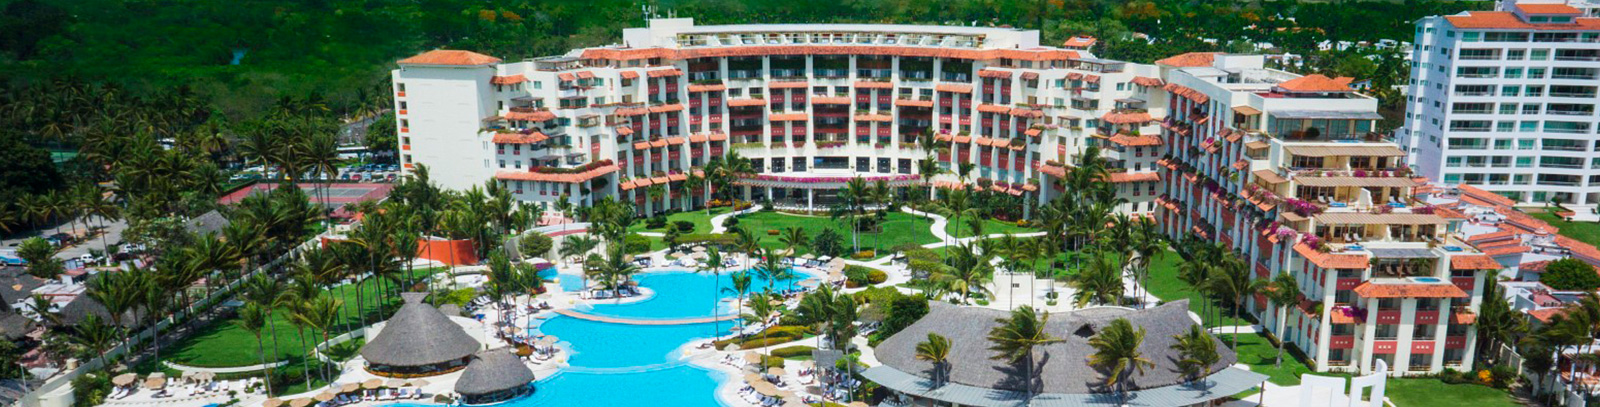 Grand Velas Riviera Nayarit, México